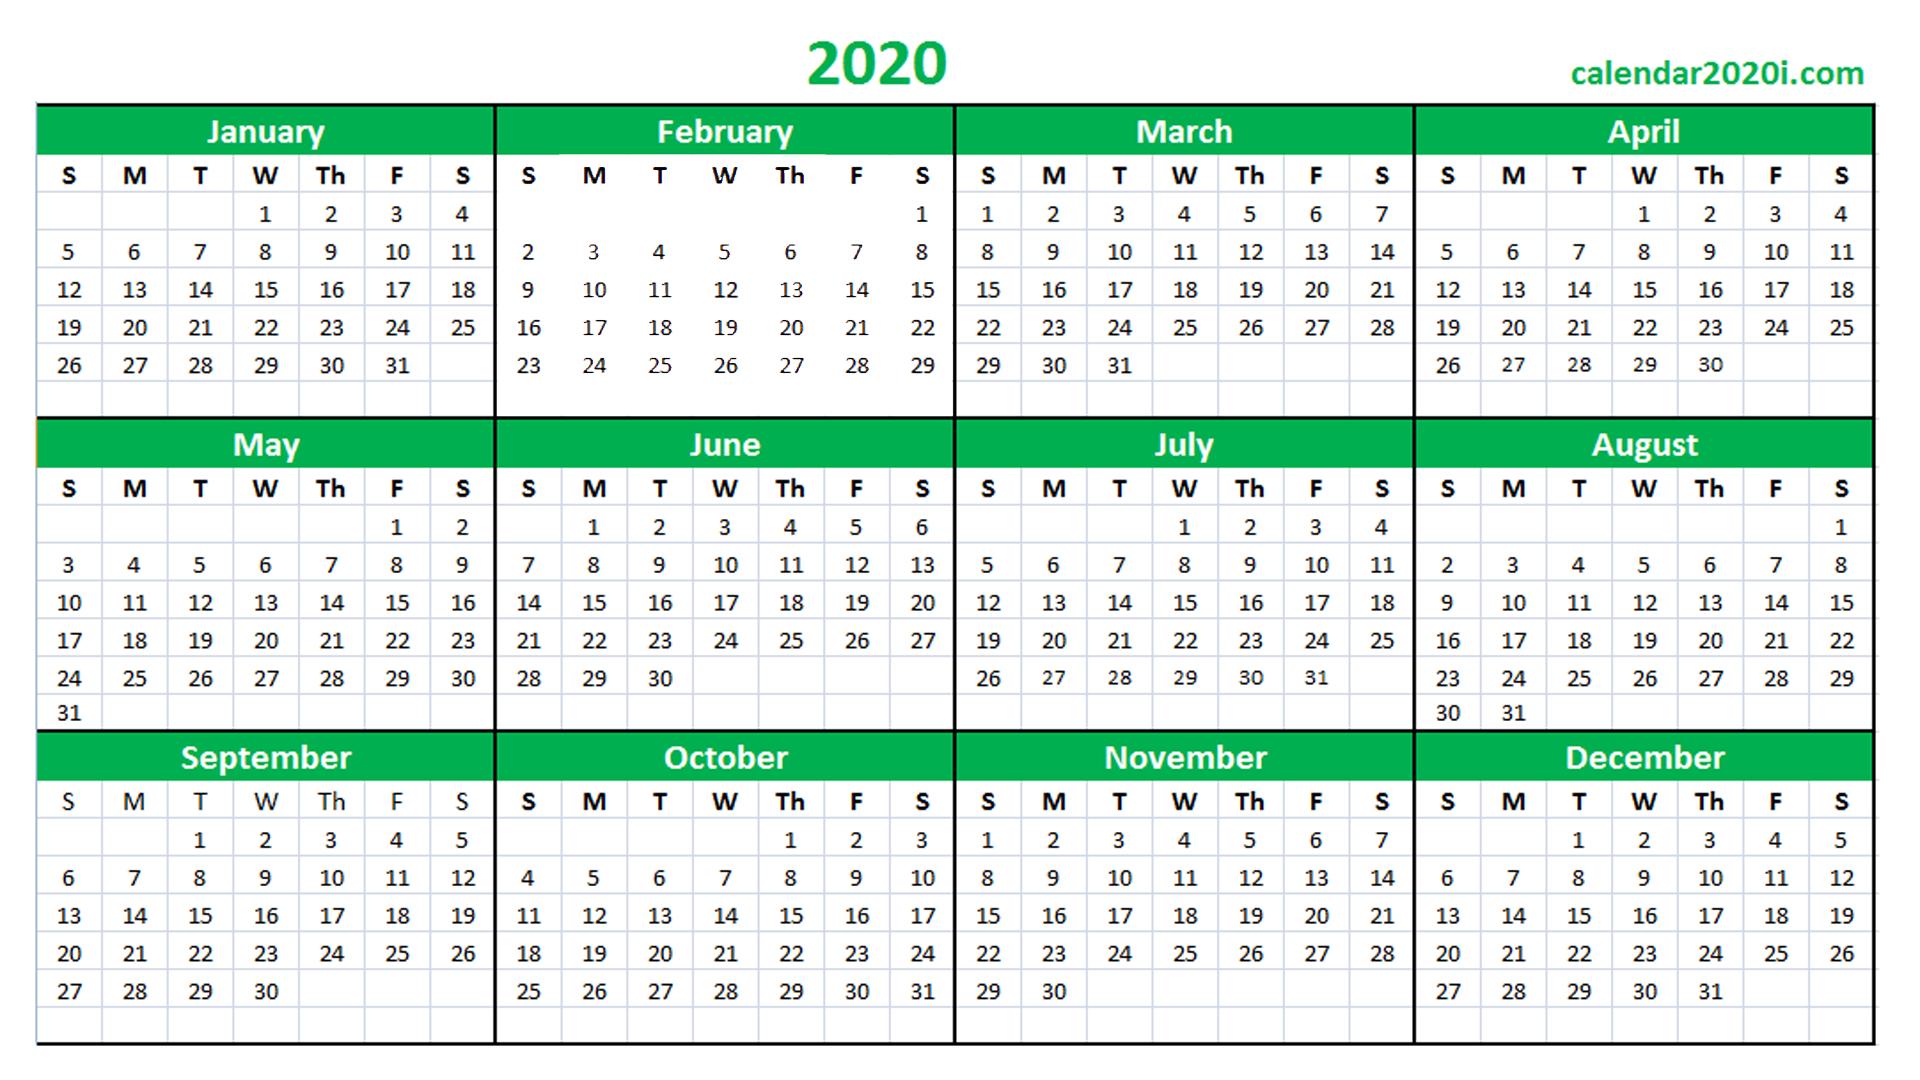 Qld School Calendar 2020 Printable | Calendar Template